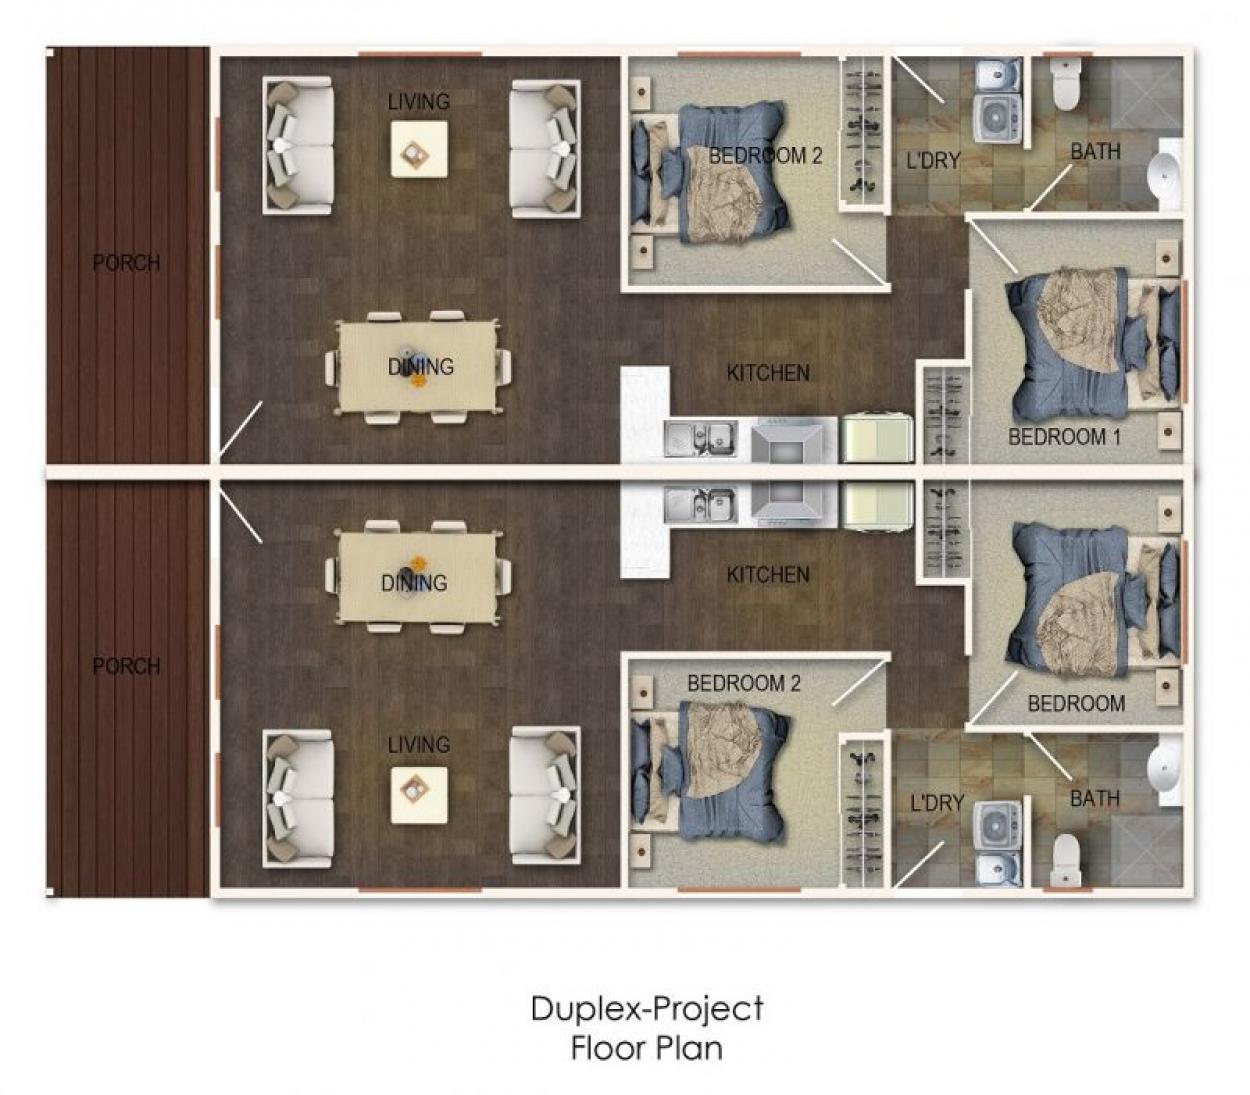 Duplex coming to site 120 at Pelican Shores